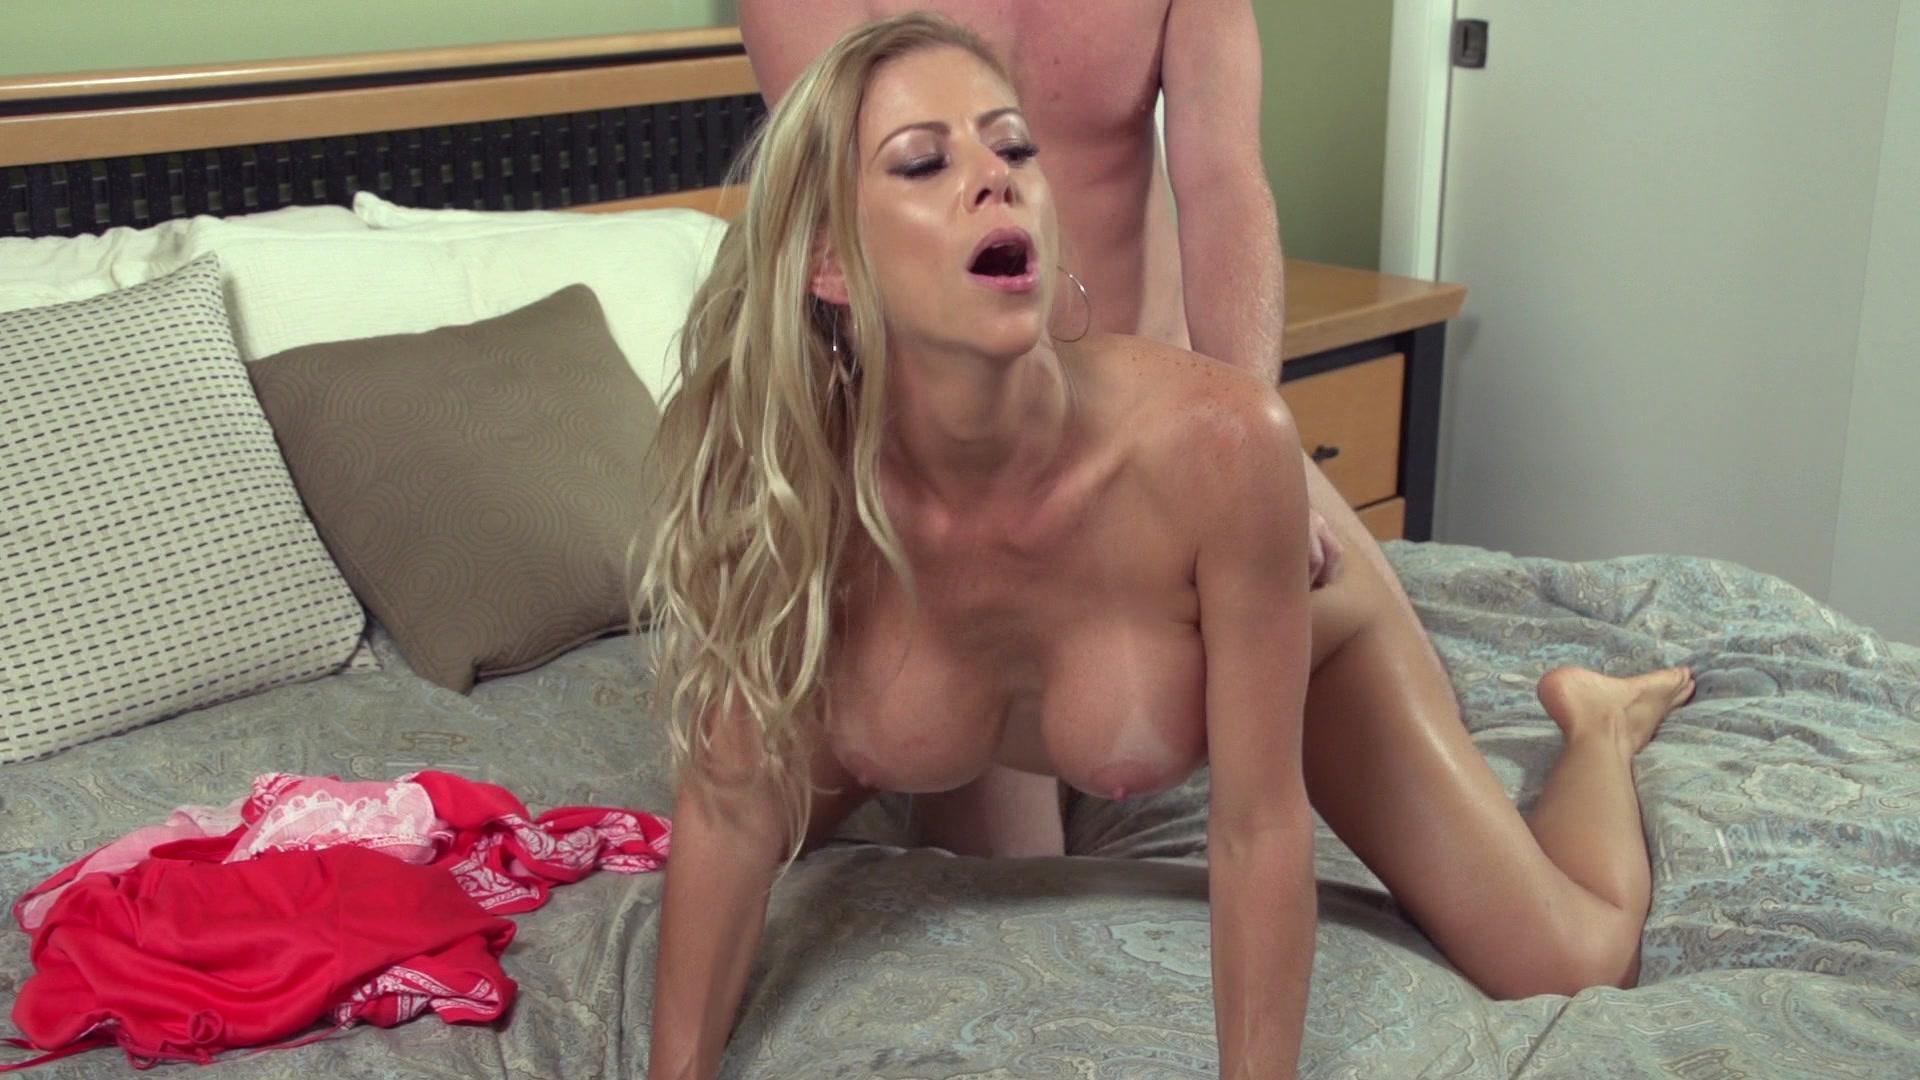 Naughty stepmom alexis fawx sexually pleases horny son